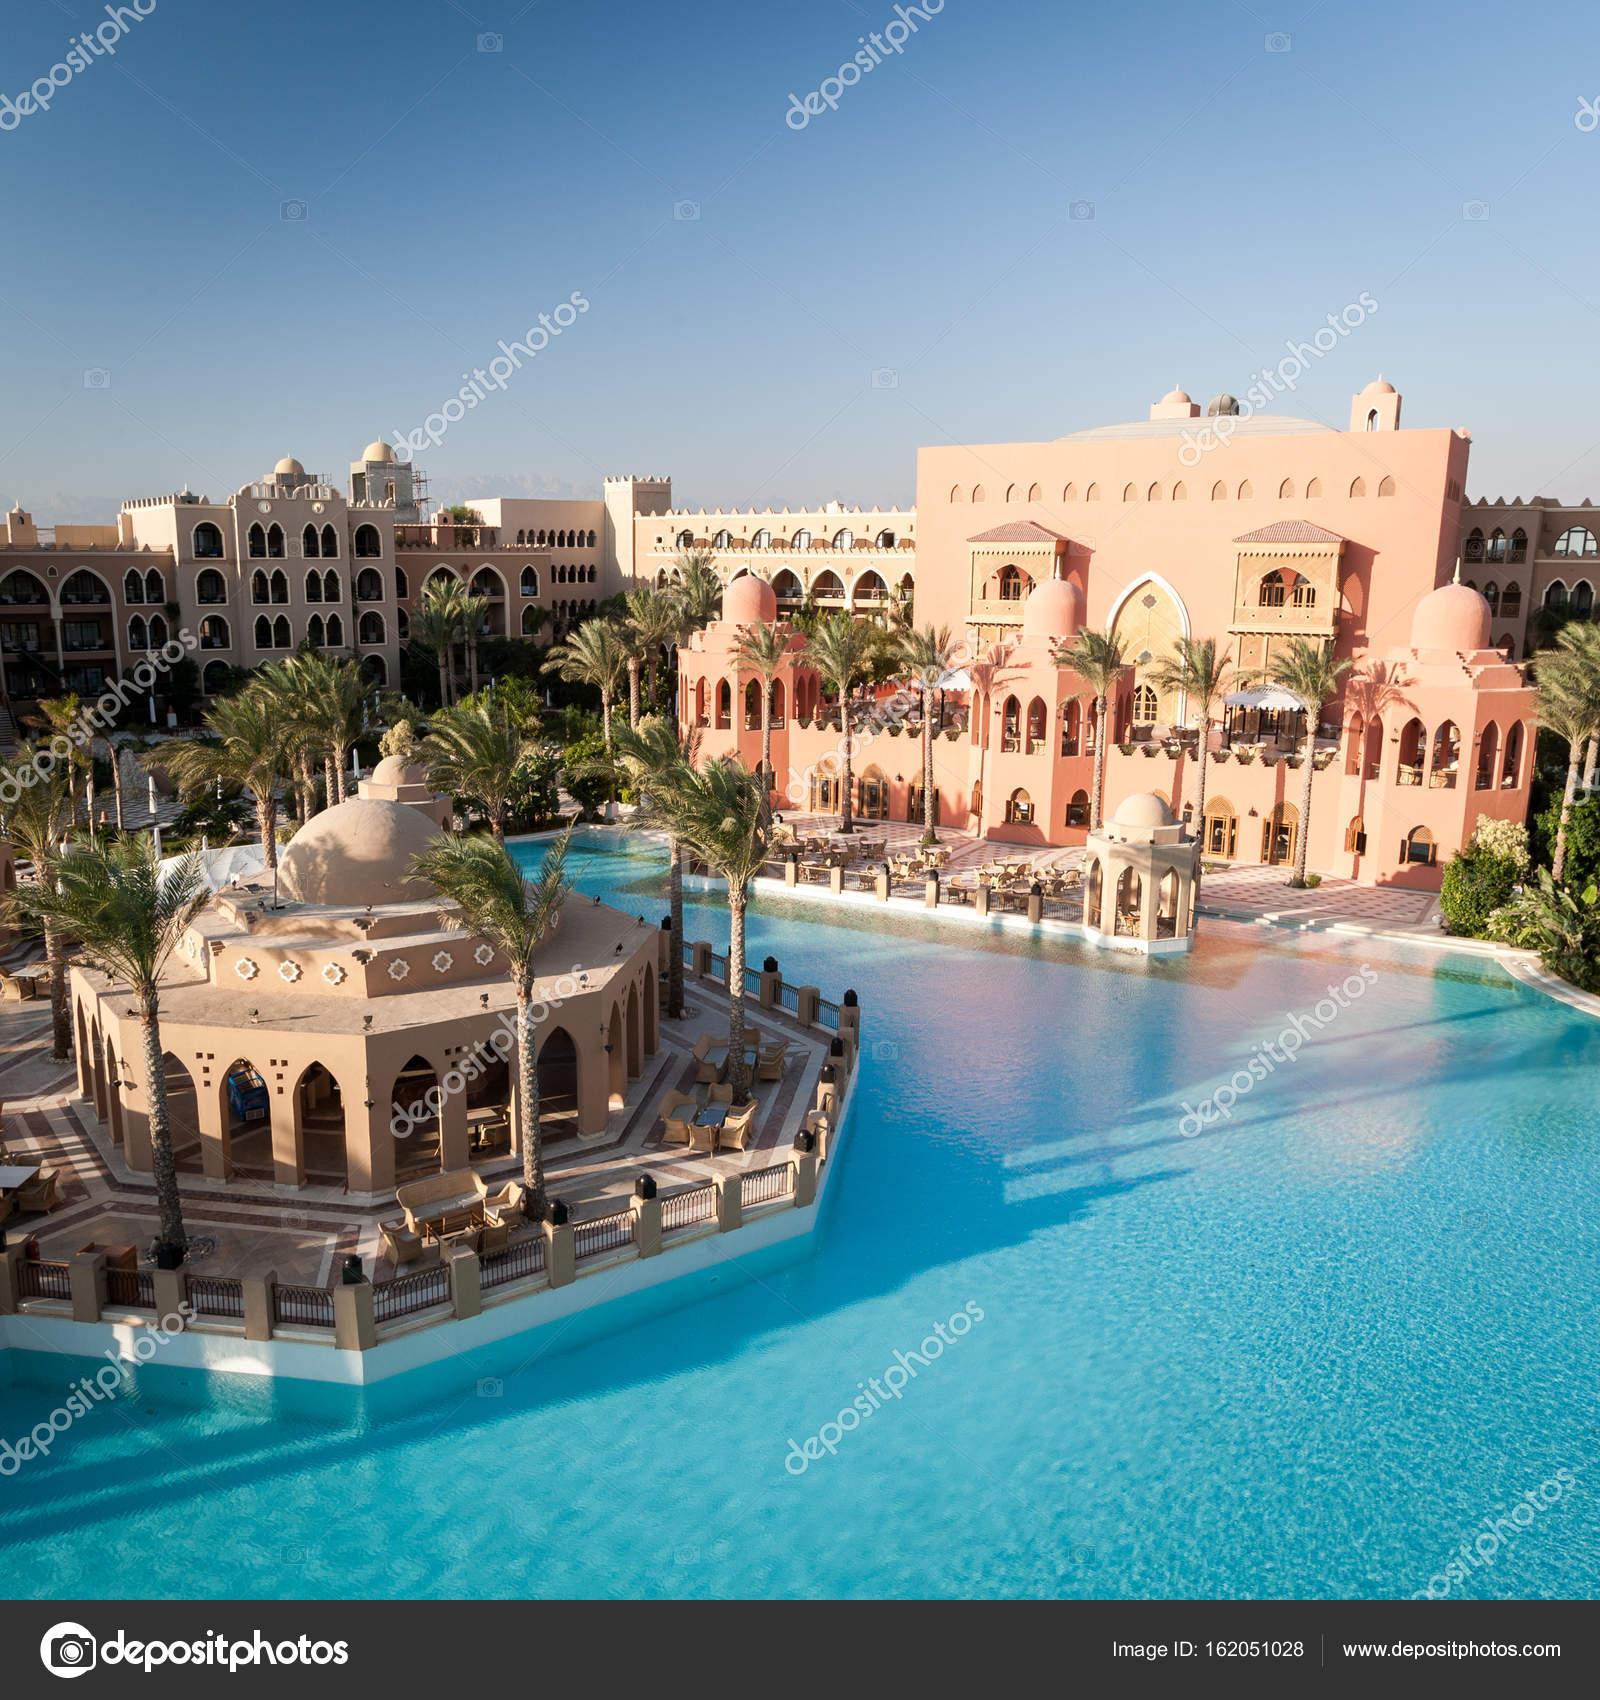 5 Sterne Hotel Hurghada Agypten Redaktionelles Stockfoto C Pxl